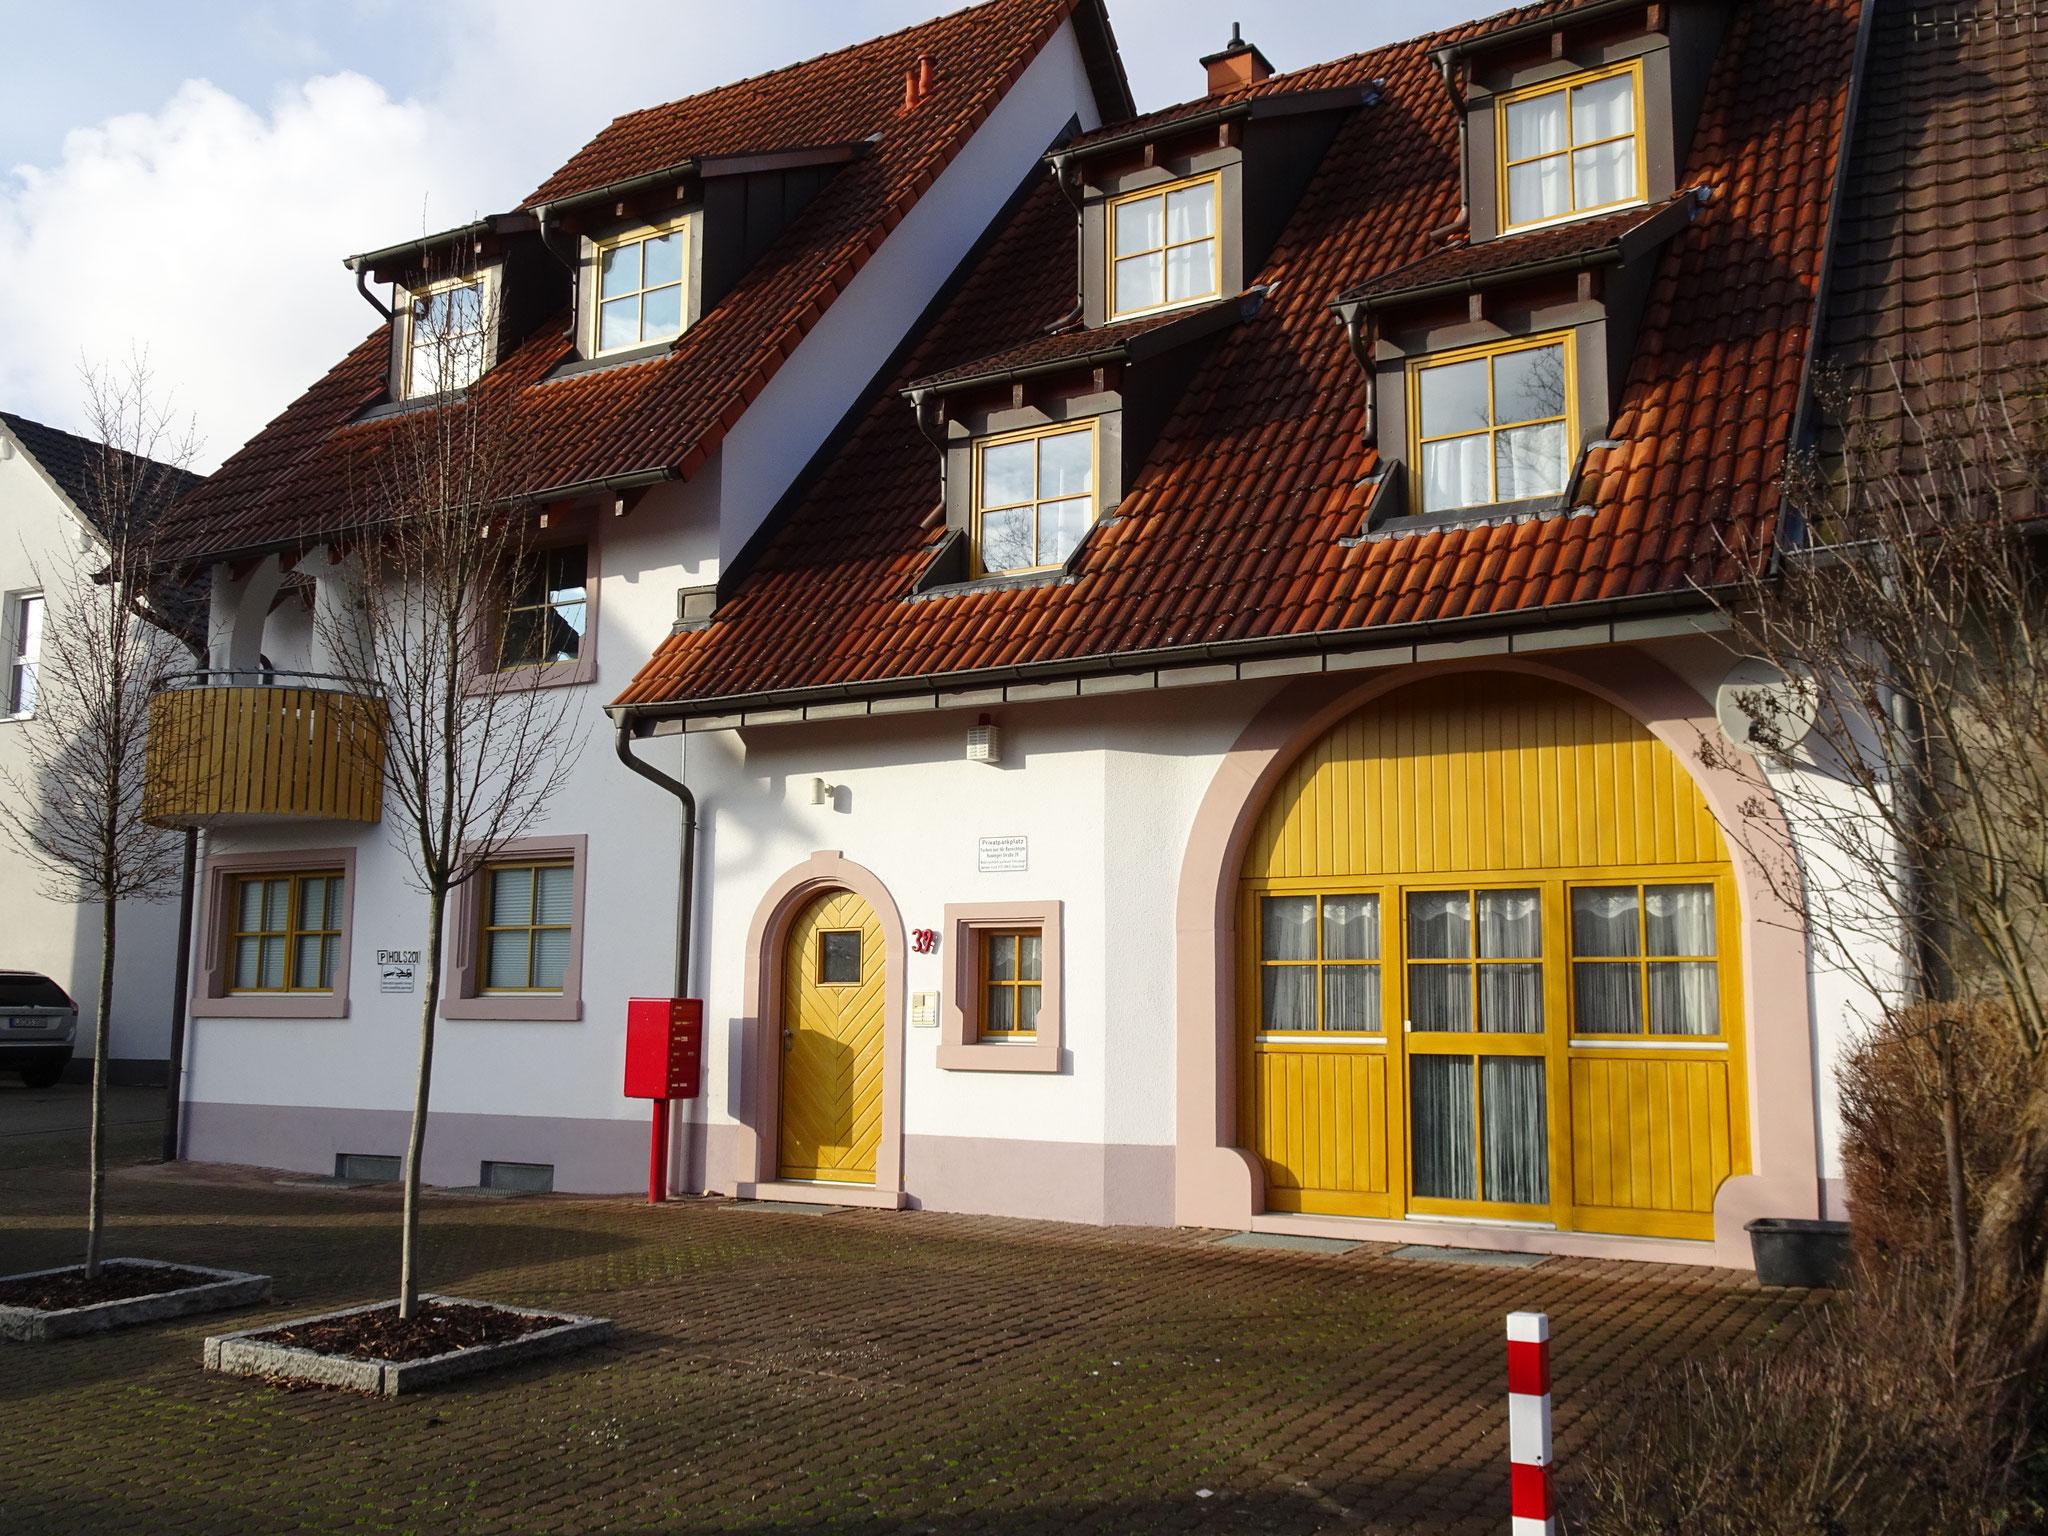 Wohnhaus Hauingerstrasse nachher